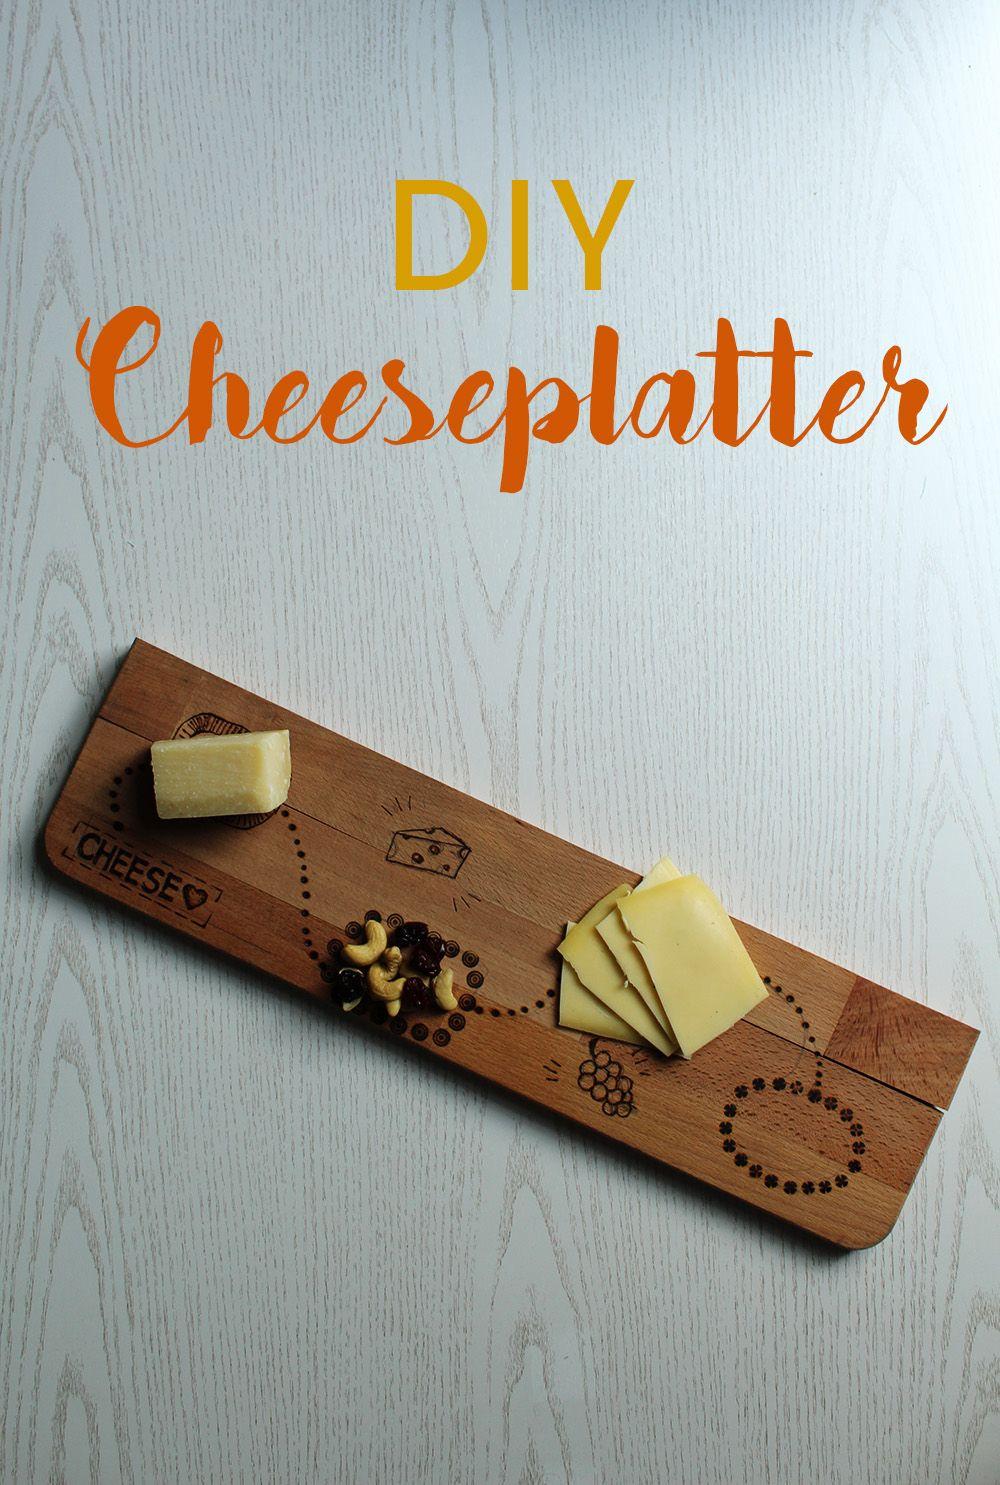 diy: käseplatte mit holzbrenner gestalten | pinterest